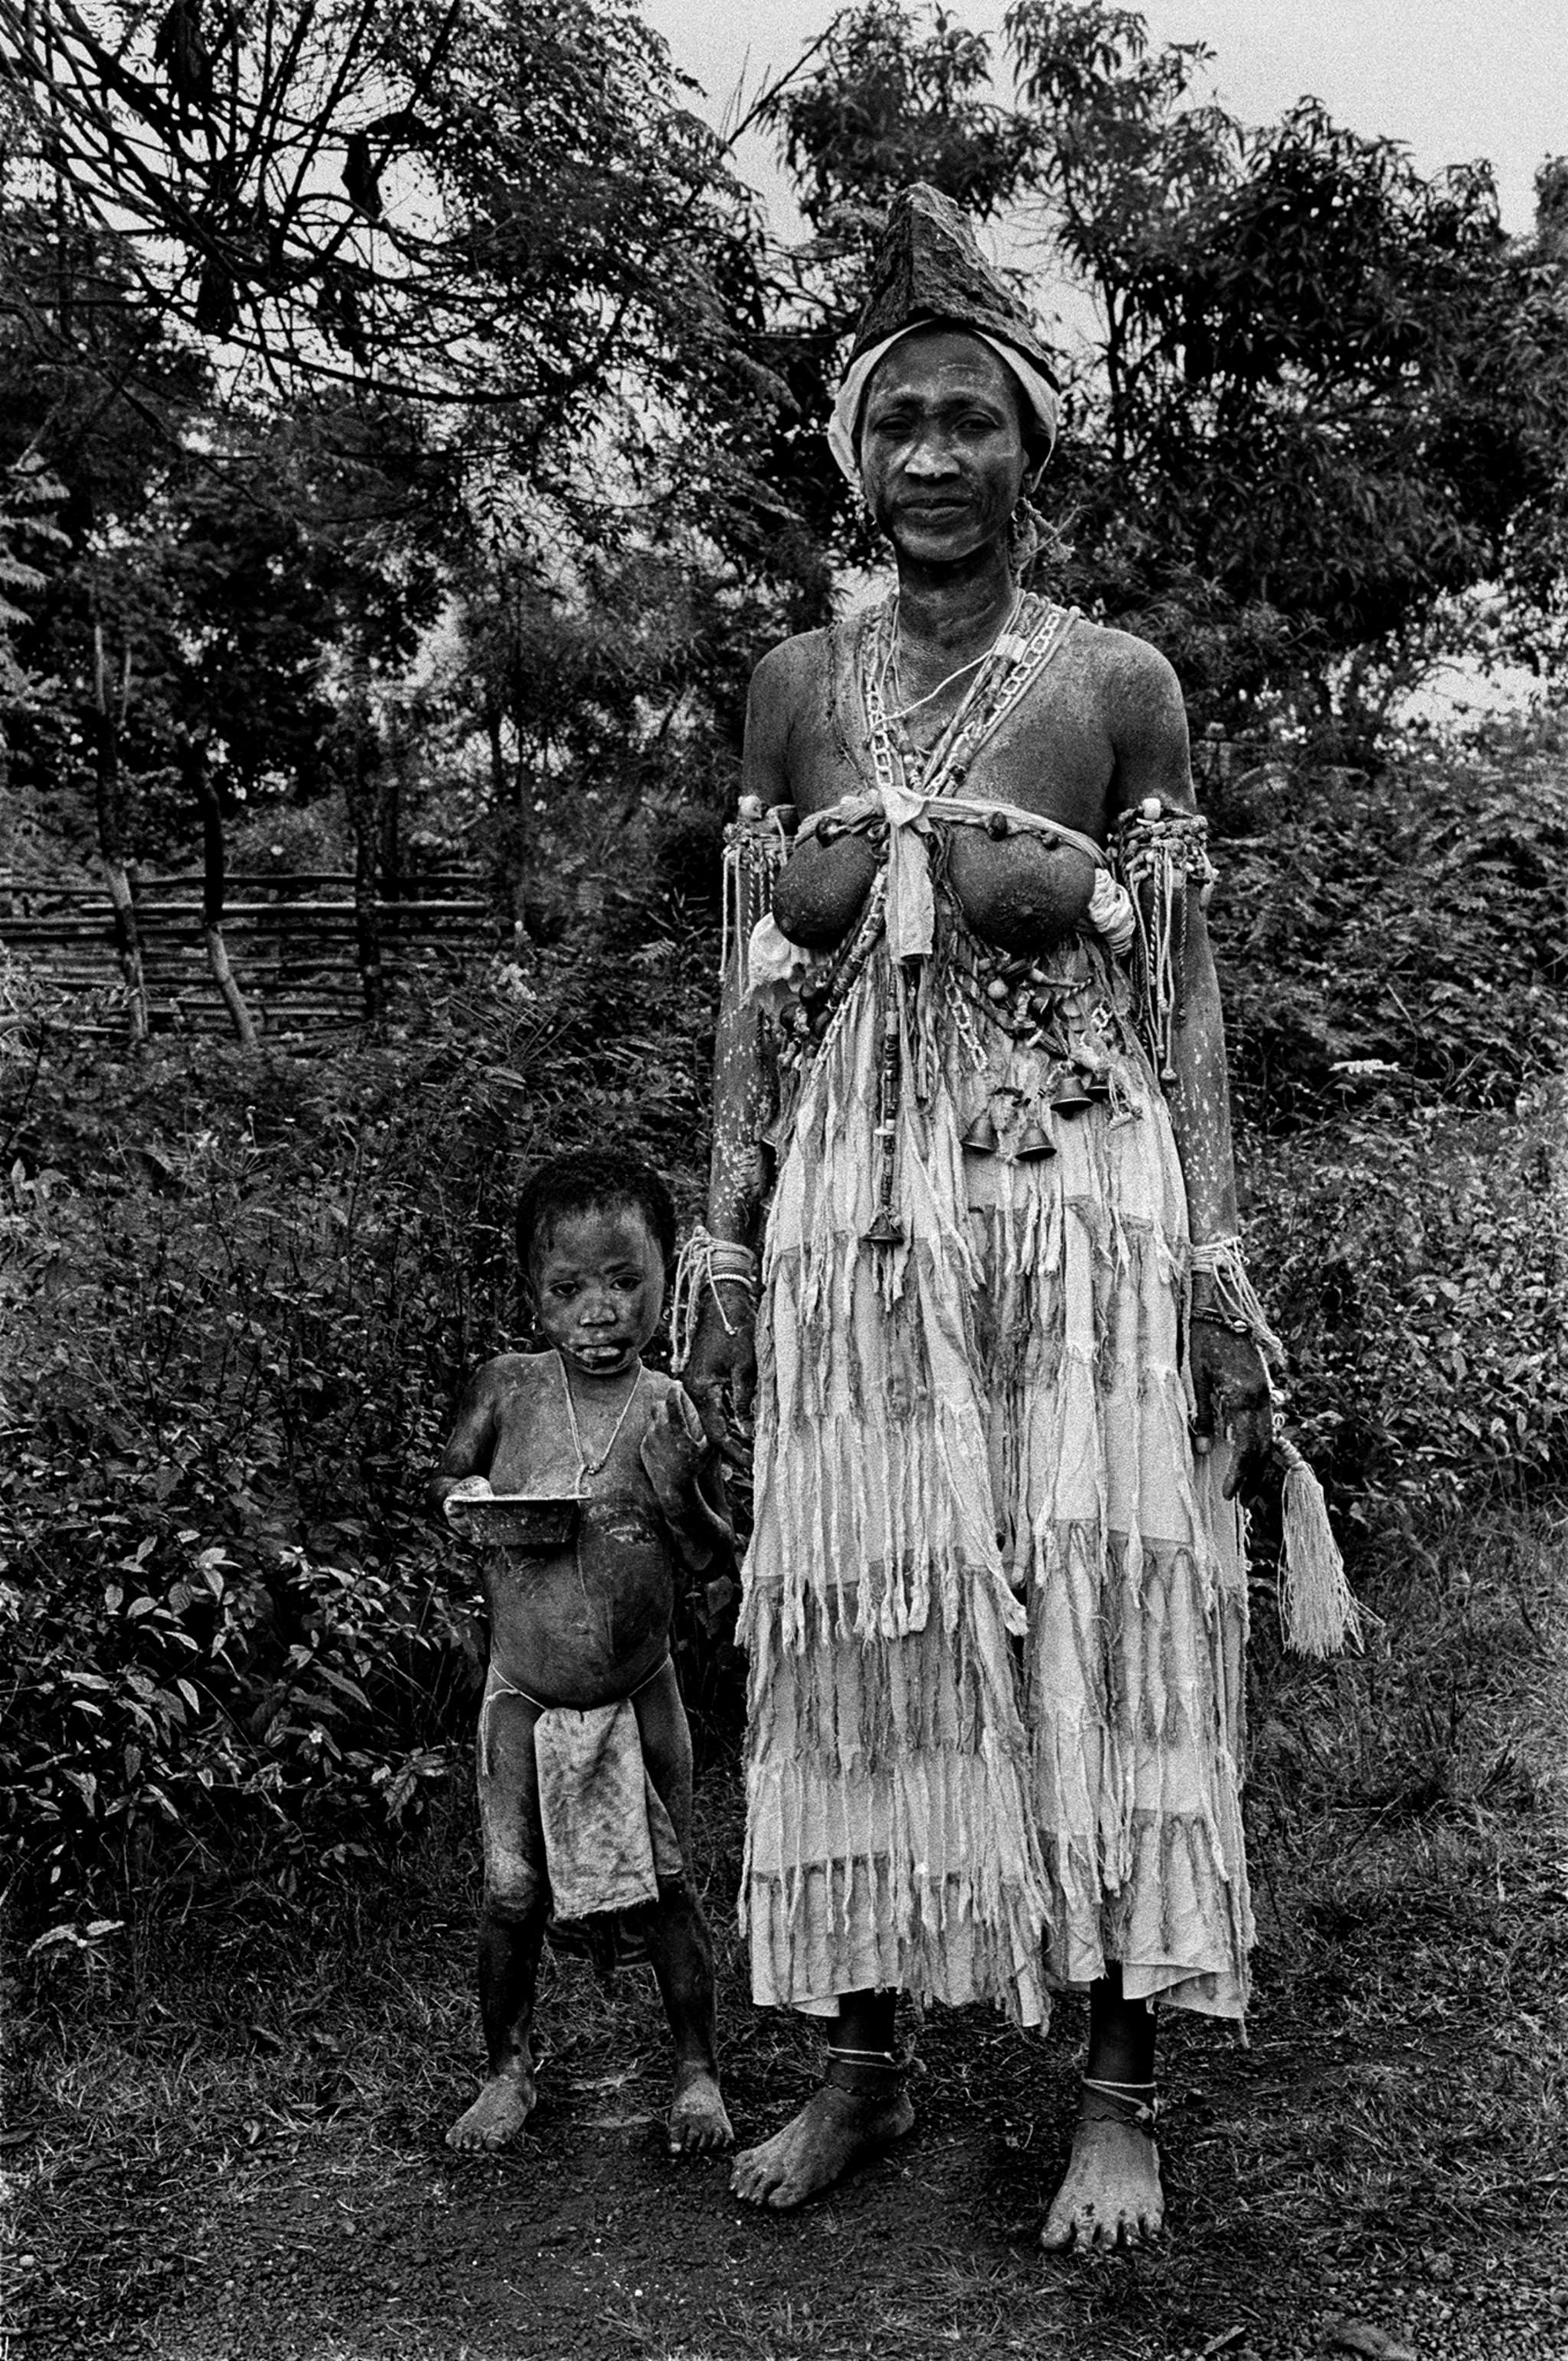 Sèrie: Viatge al país de les ànimes. Komian Nana Mandodja. Tanguelan. Costa d'Ivori 1998.